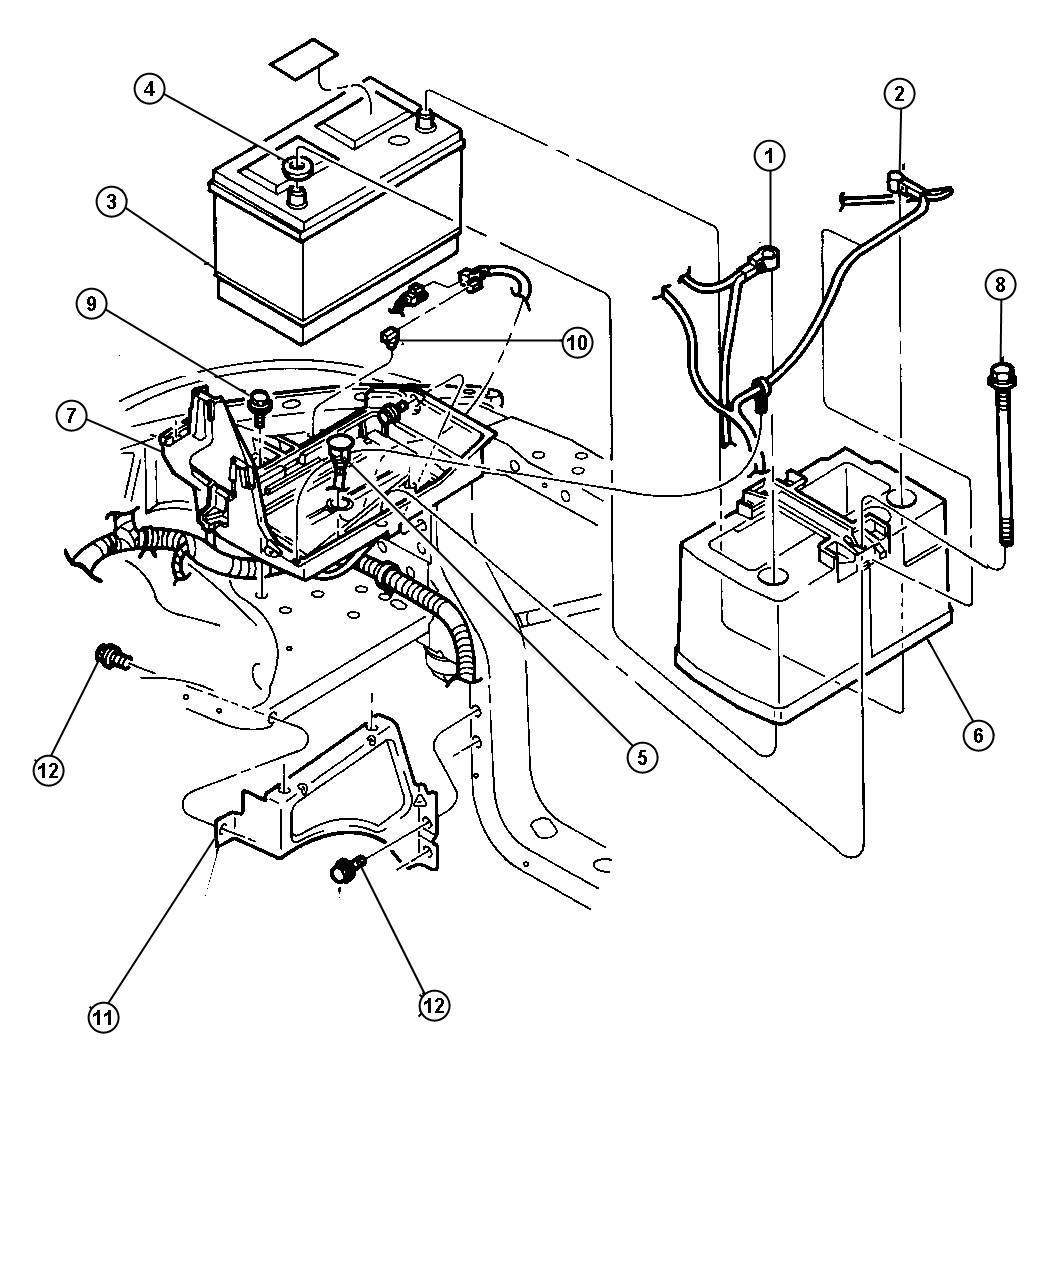 Dodge Dakota Magnum 5 2l Smpi V8 4 Spd Automatic 4re Battery Tray Amp Cables